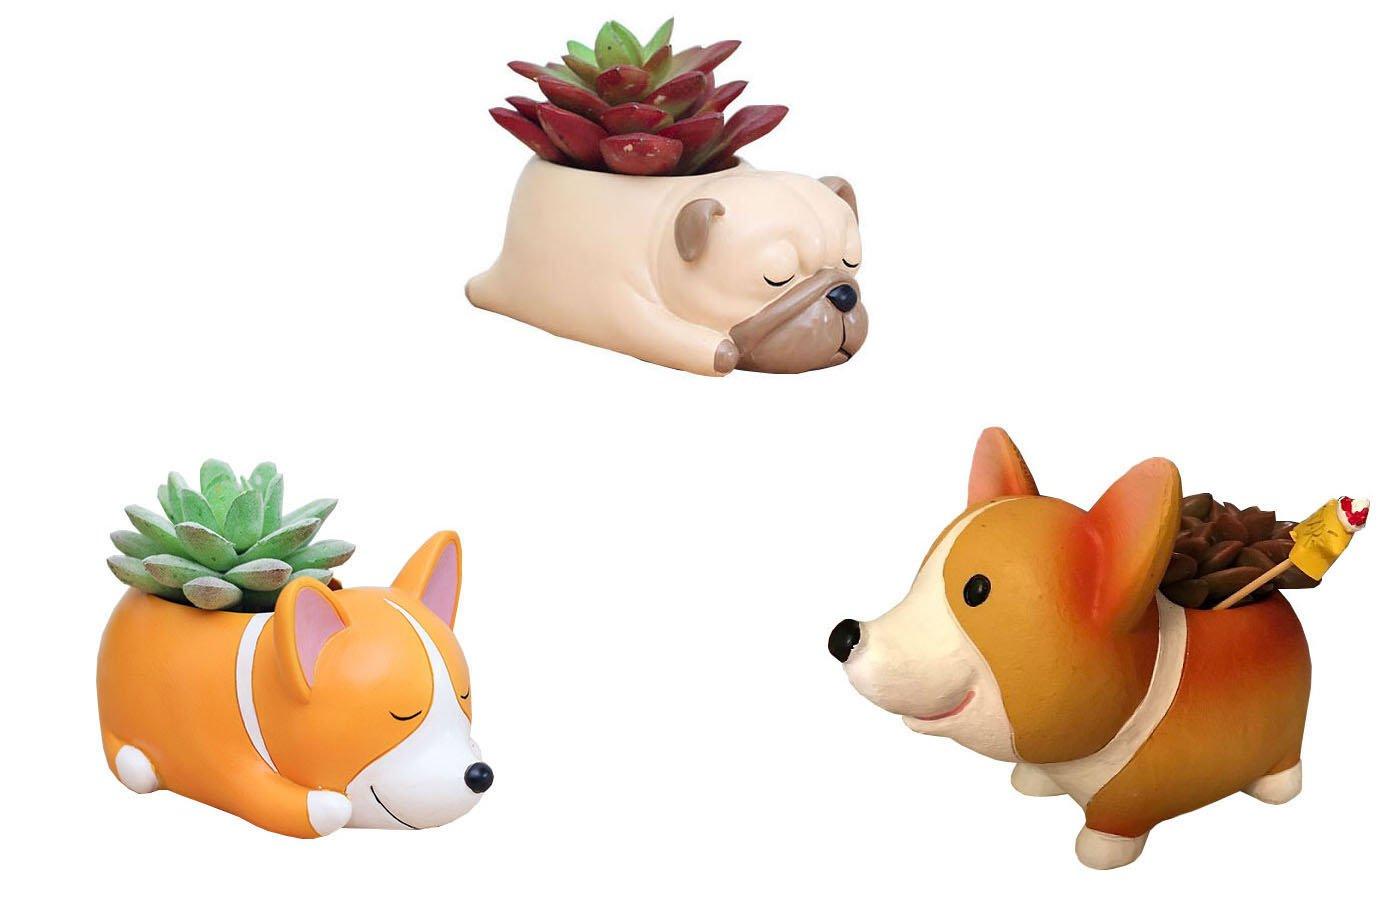 Everyday Better Life 3 PCS Set Cute Cartoon Animal Corgi Pug Shaped Succulent Cactus Vase Flower Pot for Home Garden Office Desktop Decoration (Plants Not Included)